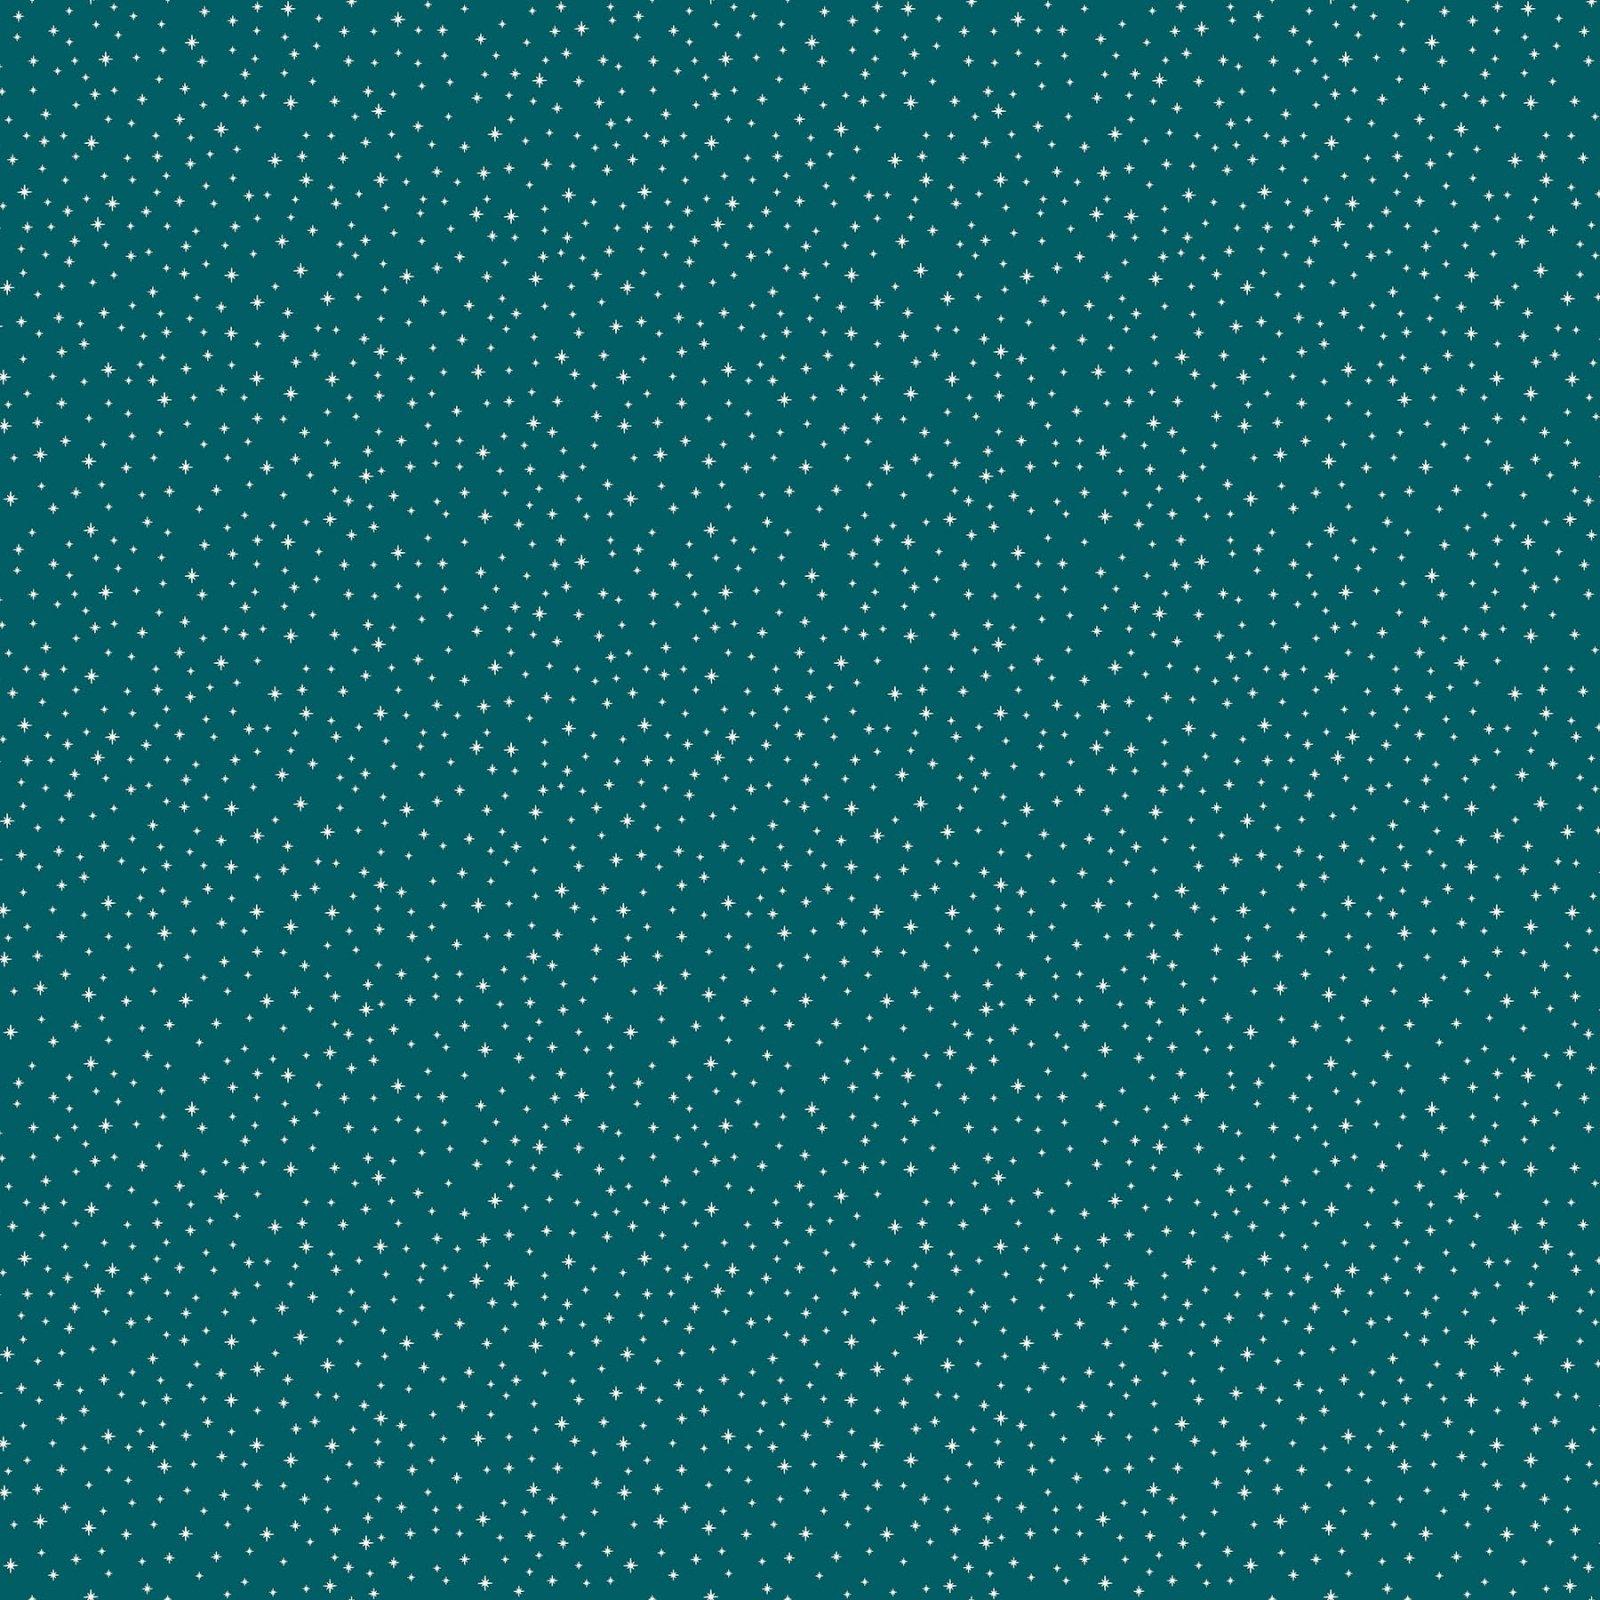 FIGO, Peppermint - Stars Dk. Green